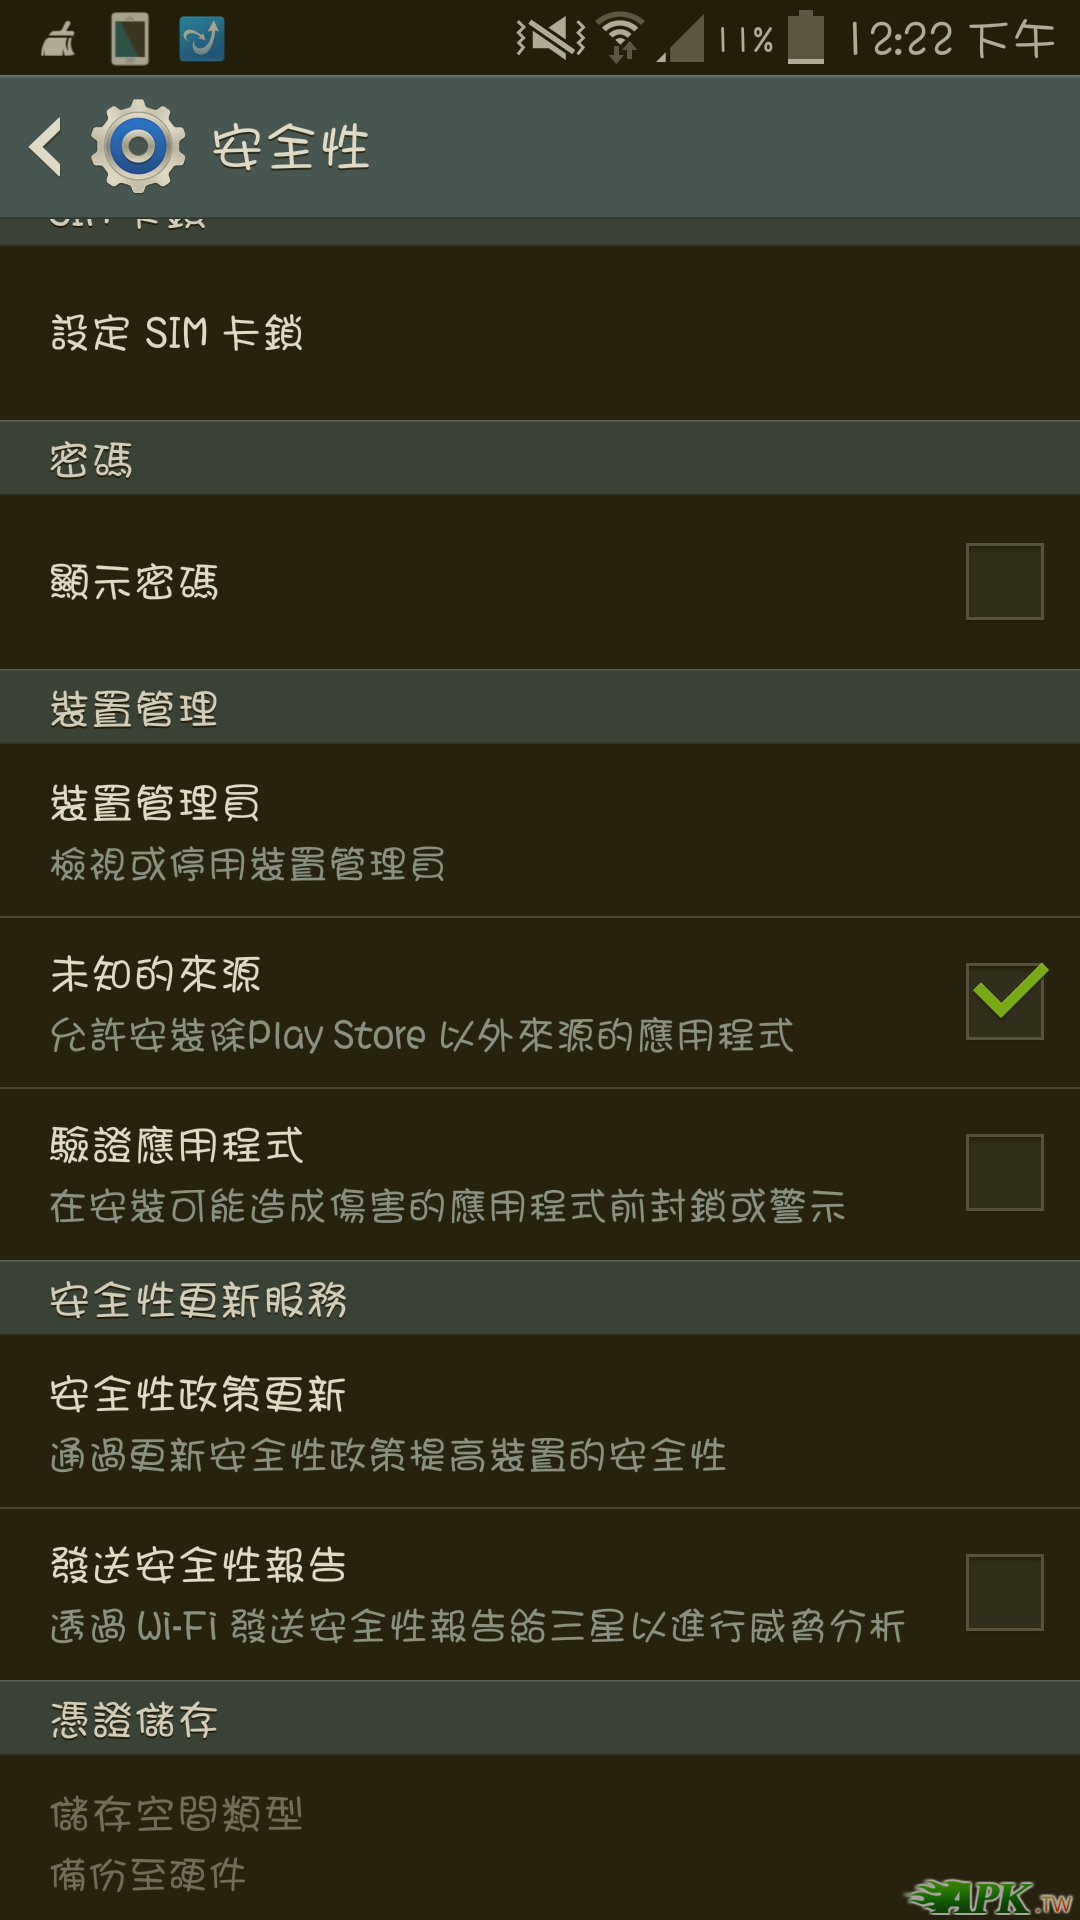 Screenshot_2014-07-06-12-22-06.png